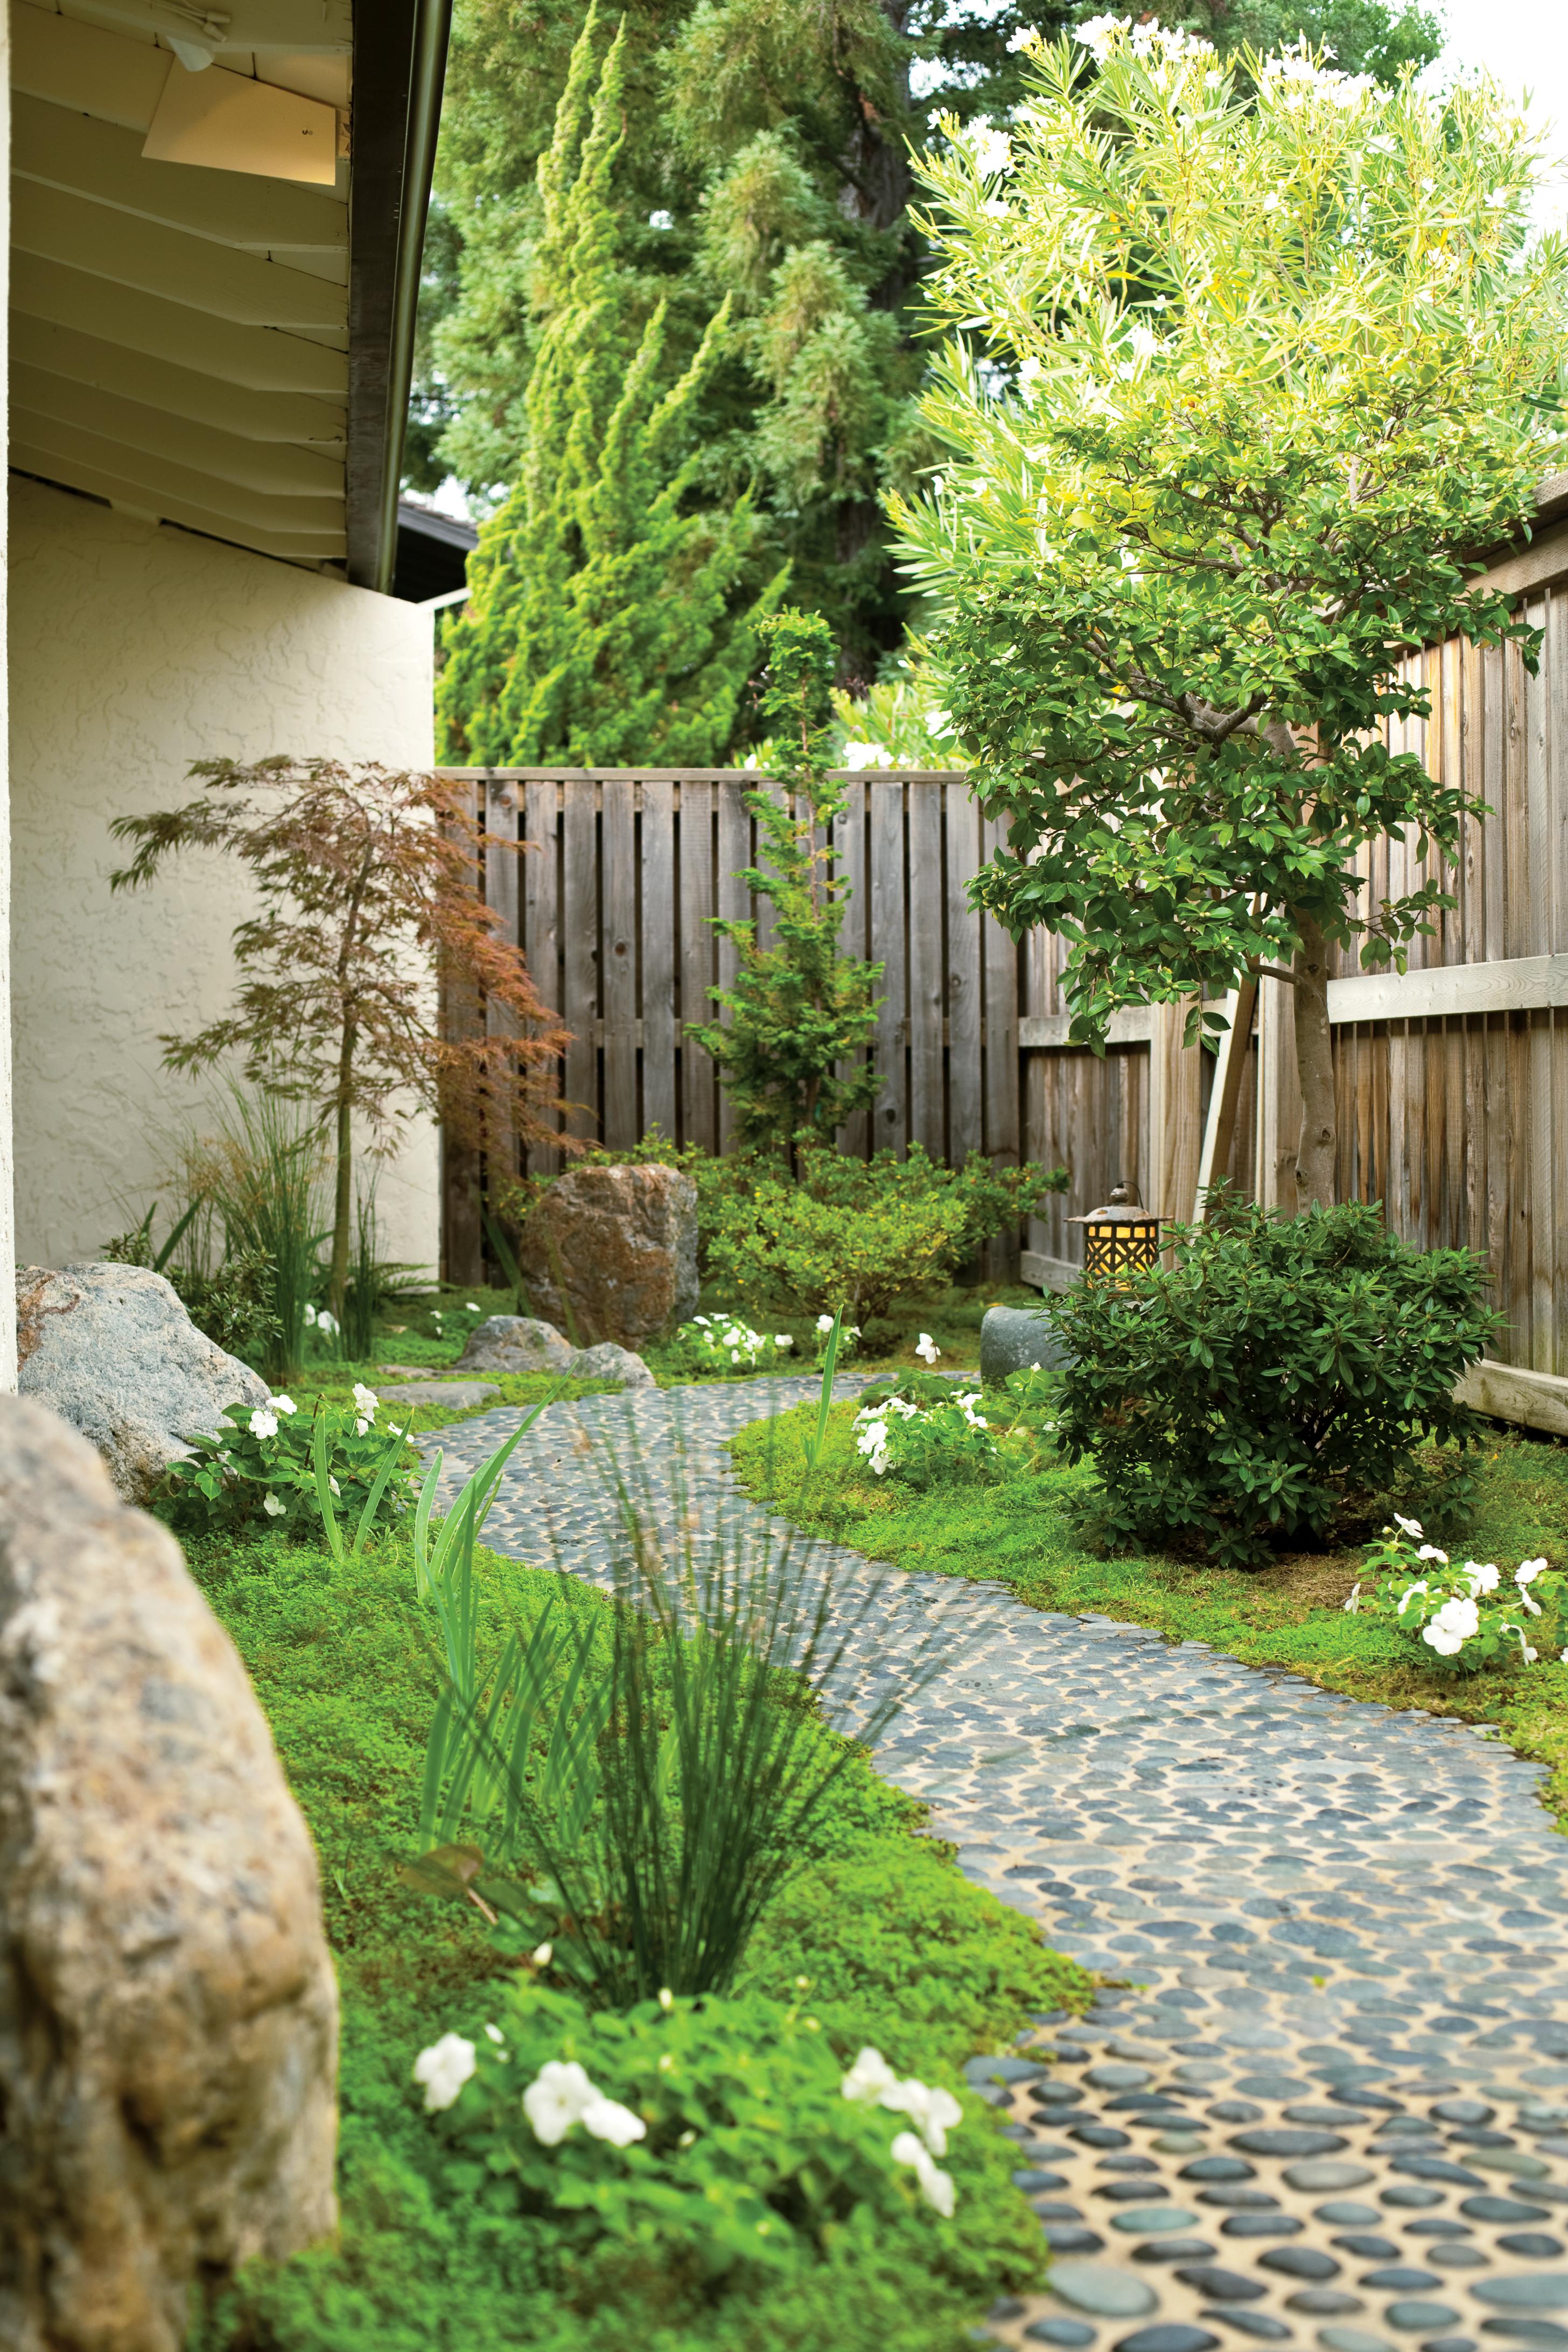 Merveilleux Set Pebble Path